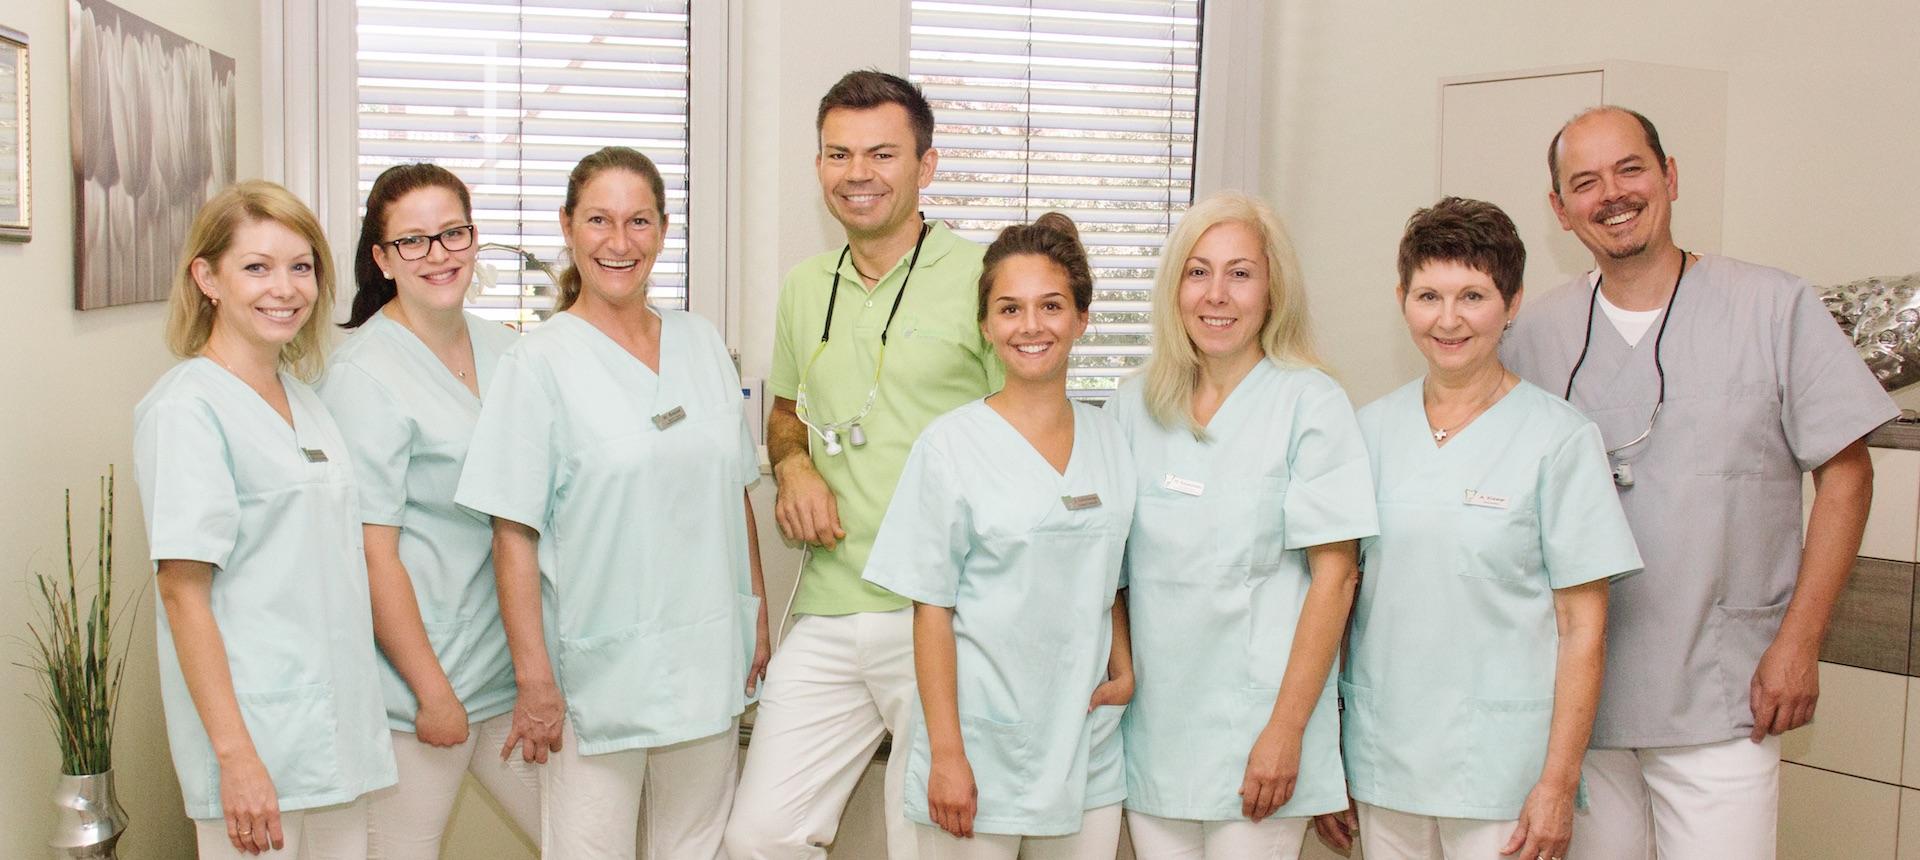 Zahnarztpraxis Adrian Makowski Menden